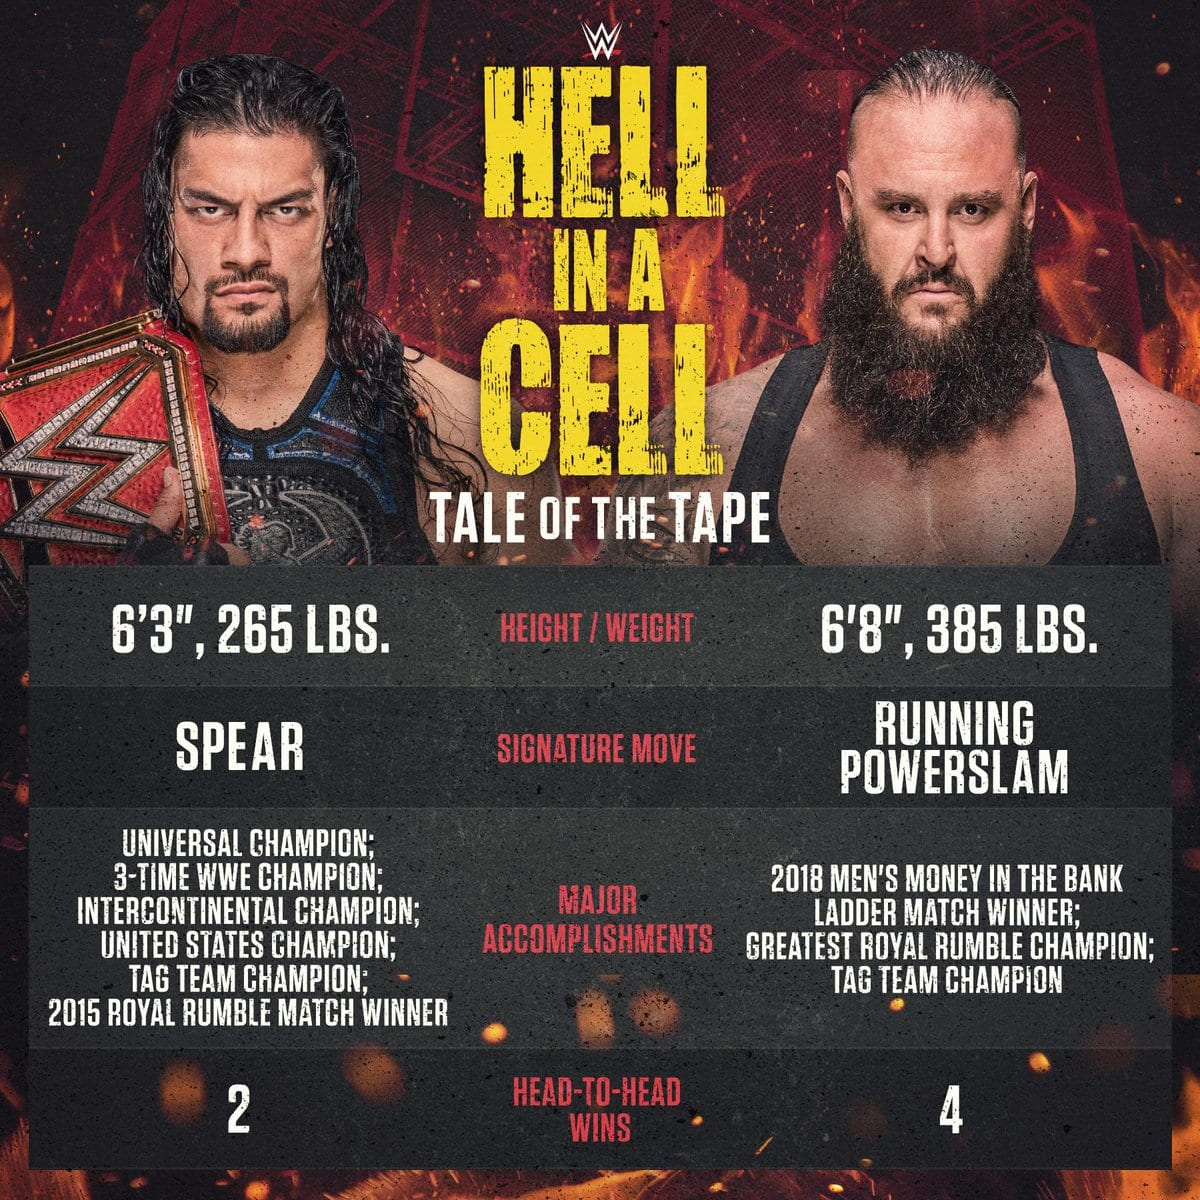 Roman Reigns vs. Braun Strowman - Tale Of The Tape